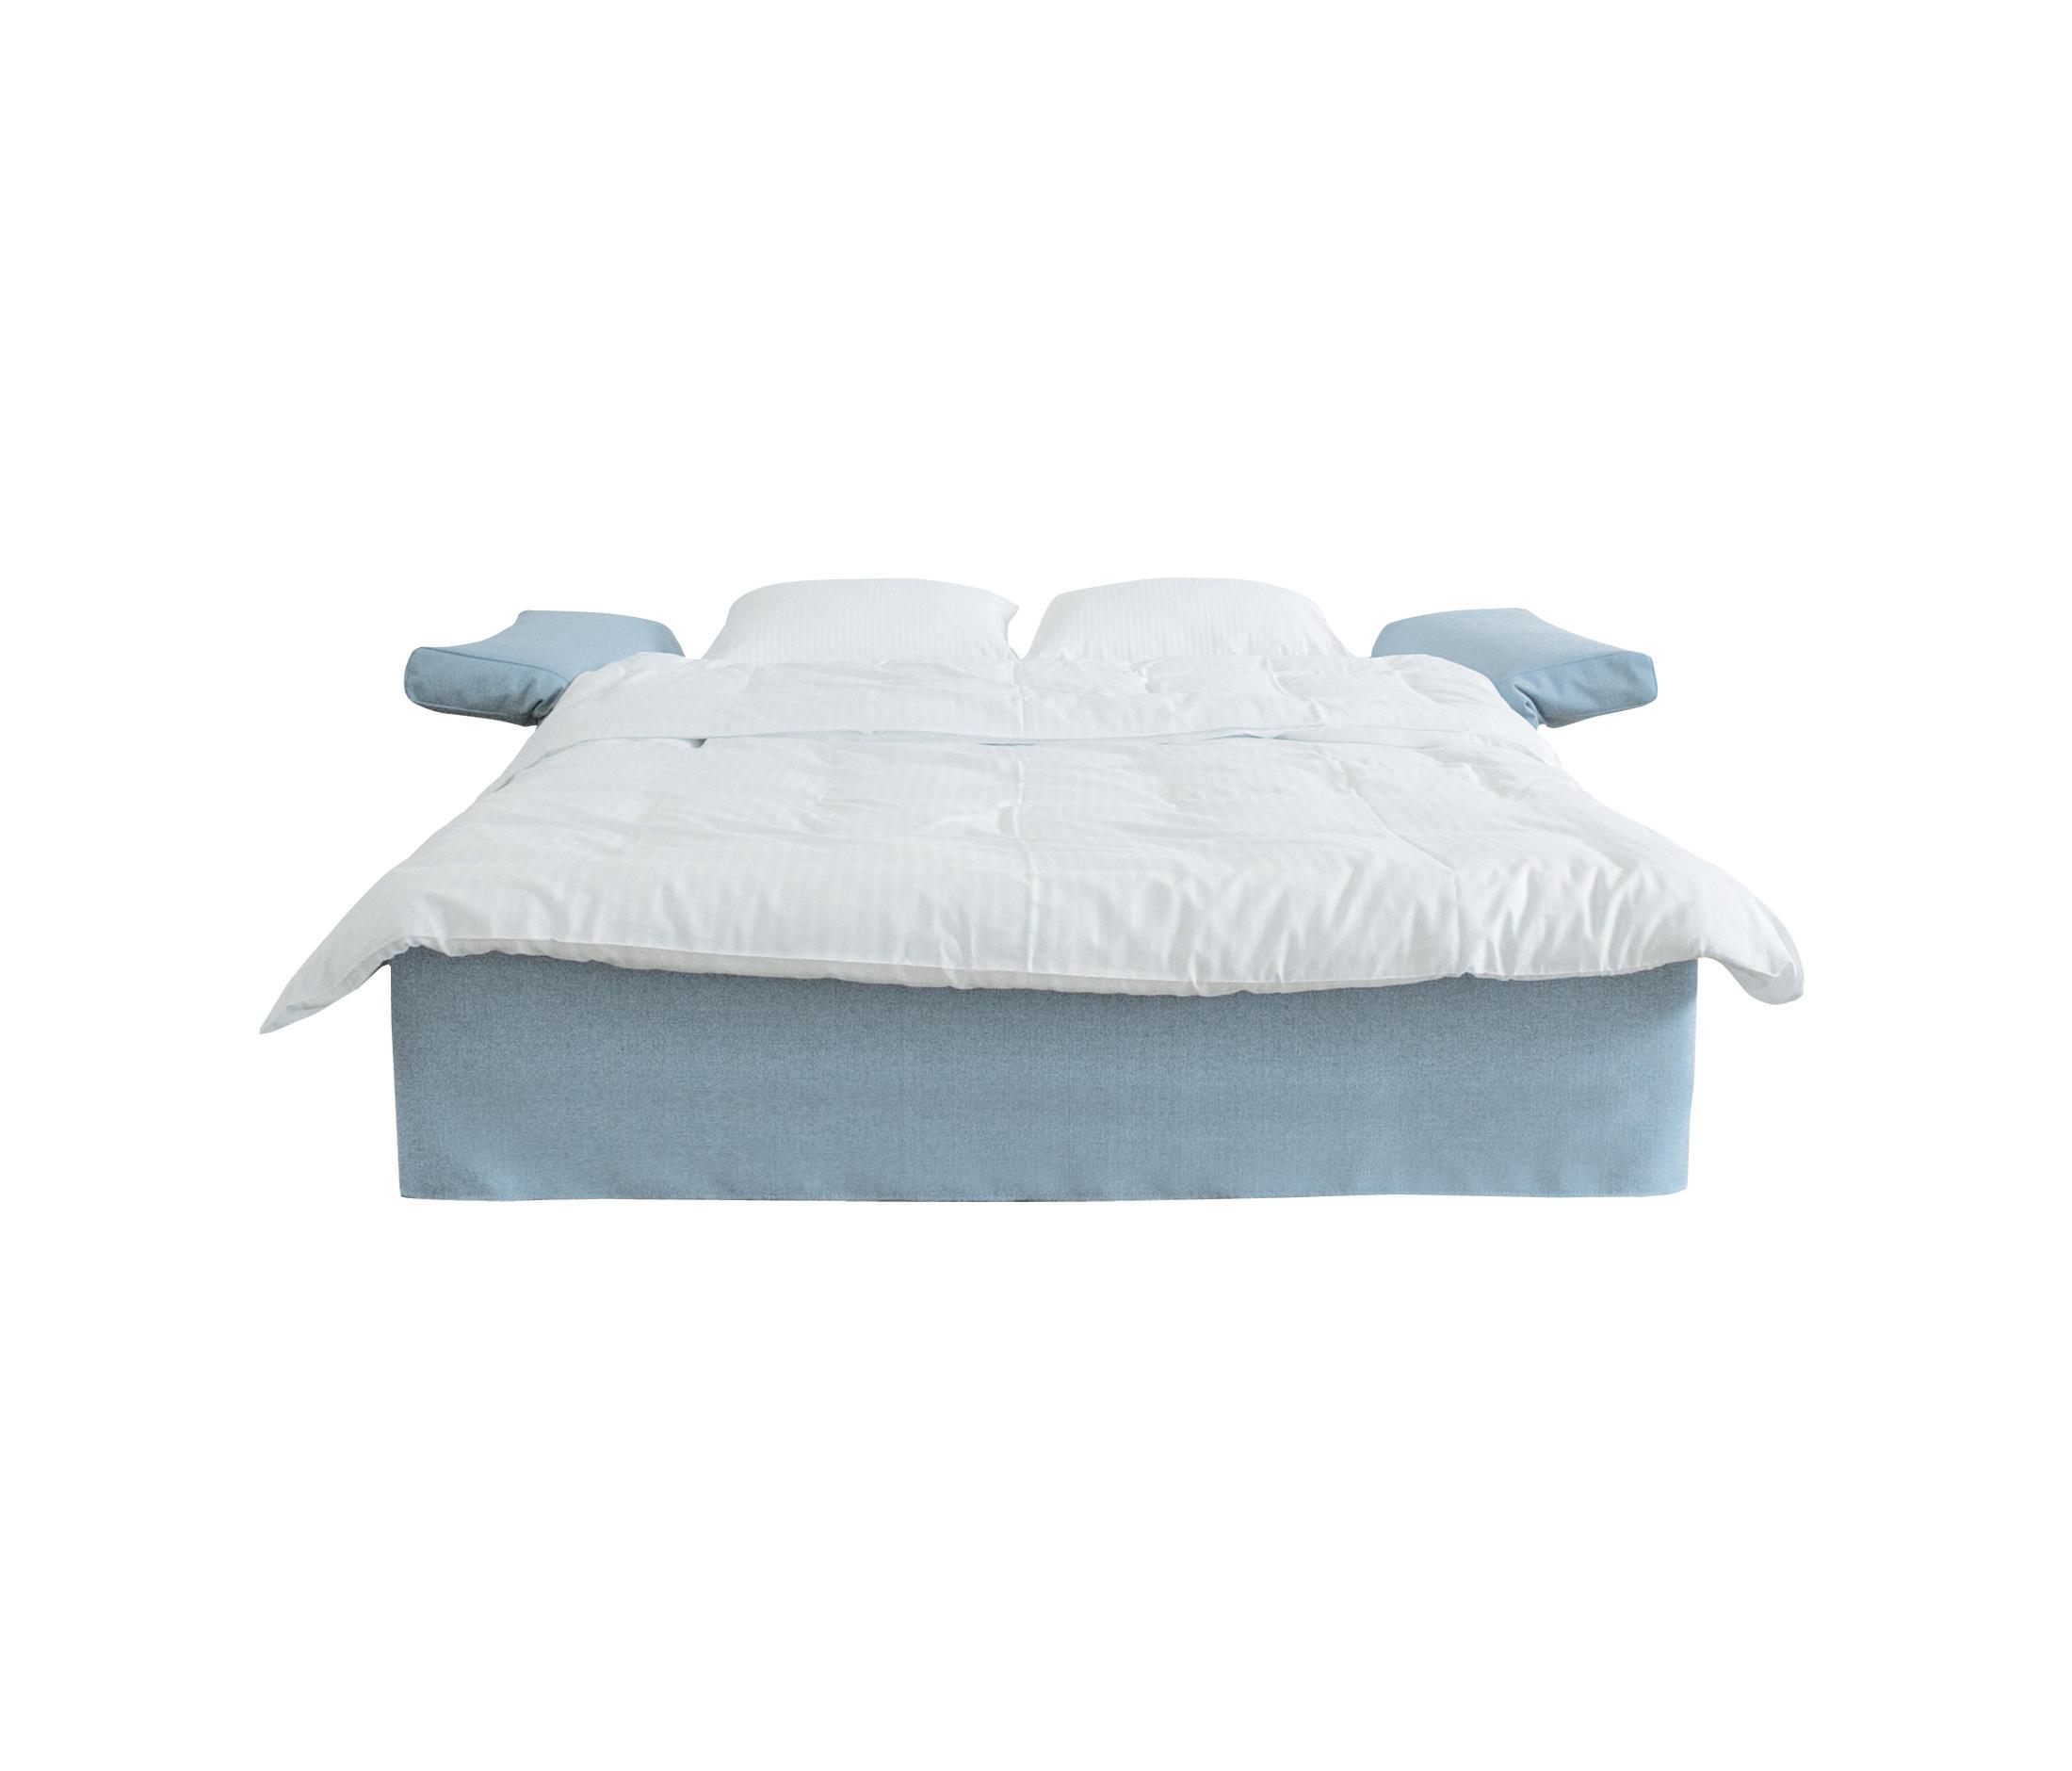 bonprix schlafsofas bettw sche winterengel set d nisches bettenlager lattenroste 140x200. Black Bedroom Furniture Sets. Home Design Ideas